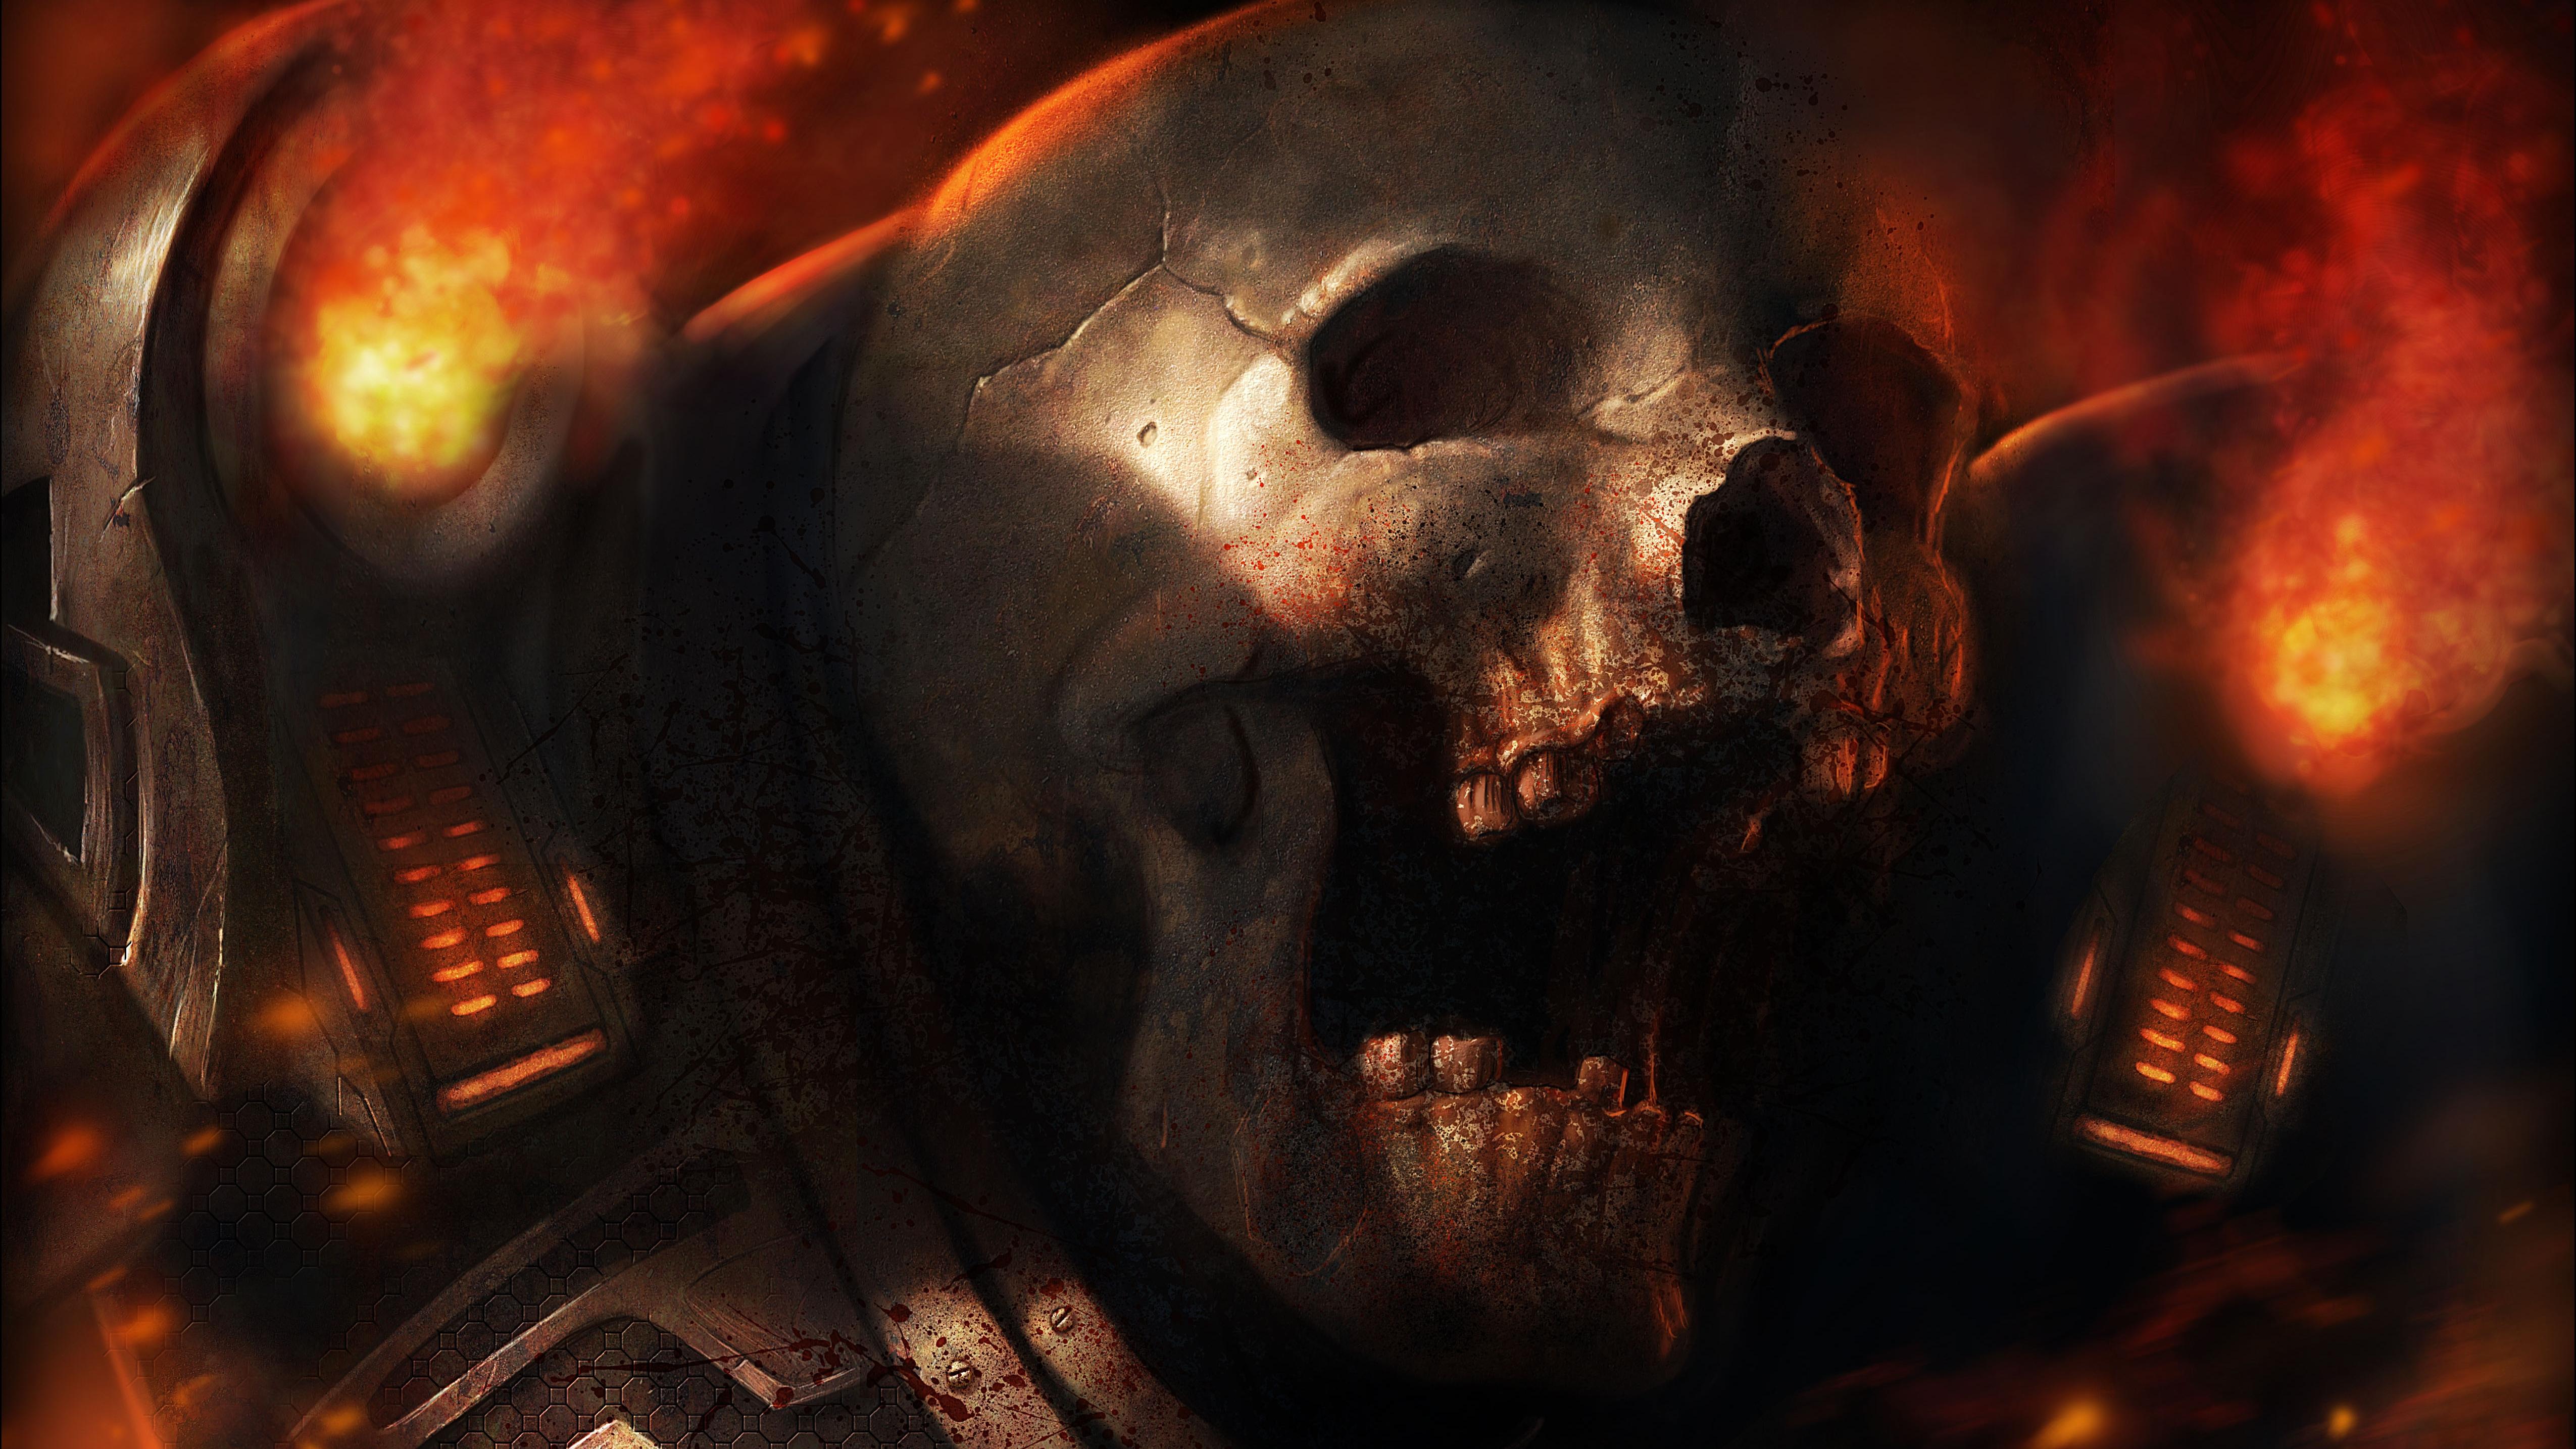 Doom 4k ultra hd wallpaper background image 5100x2869 - Demon wallpaper 4k ...